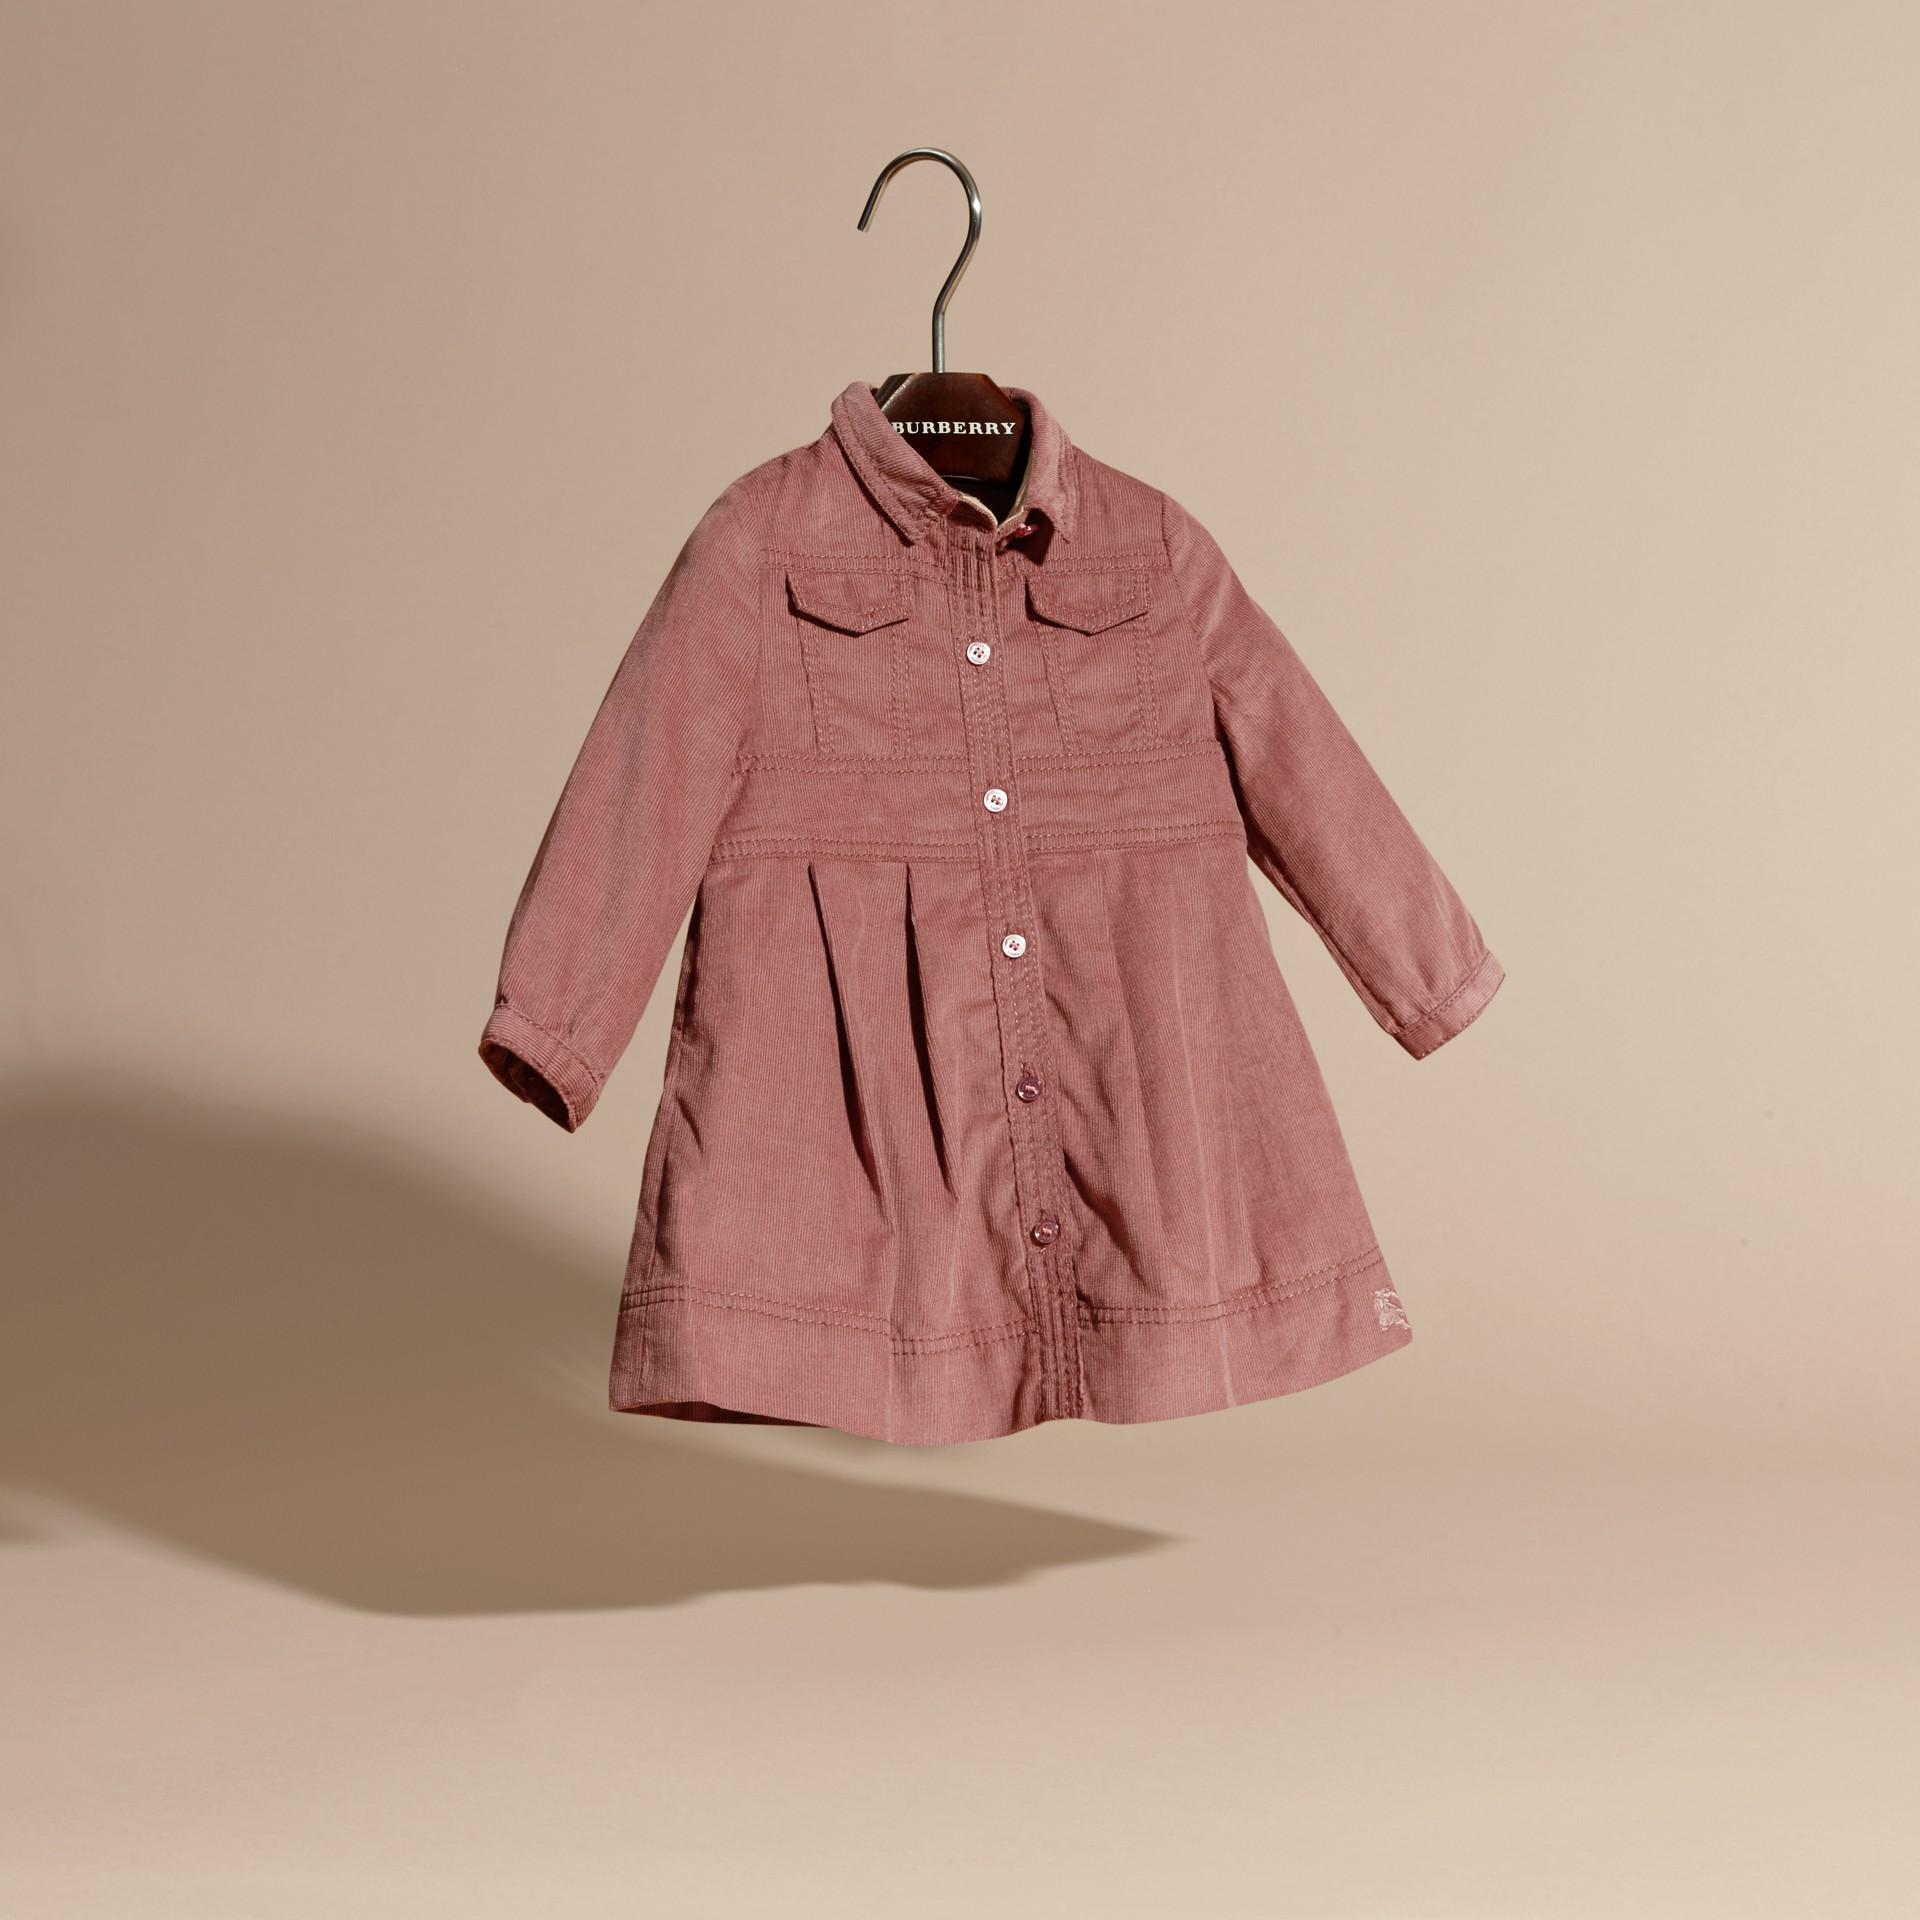 Helles aschrosa Hemdkleid aus Baumwollcord Helles Aschrosa - Galerie-Bild 3